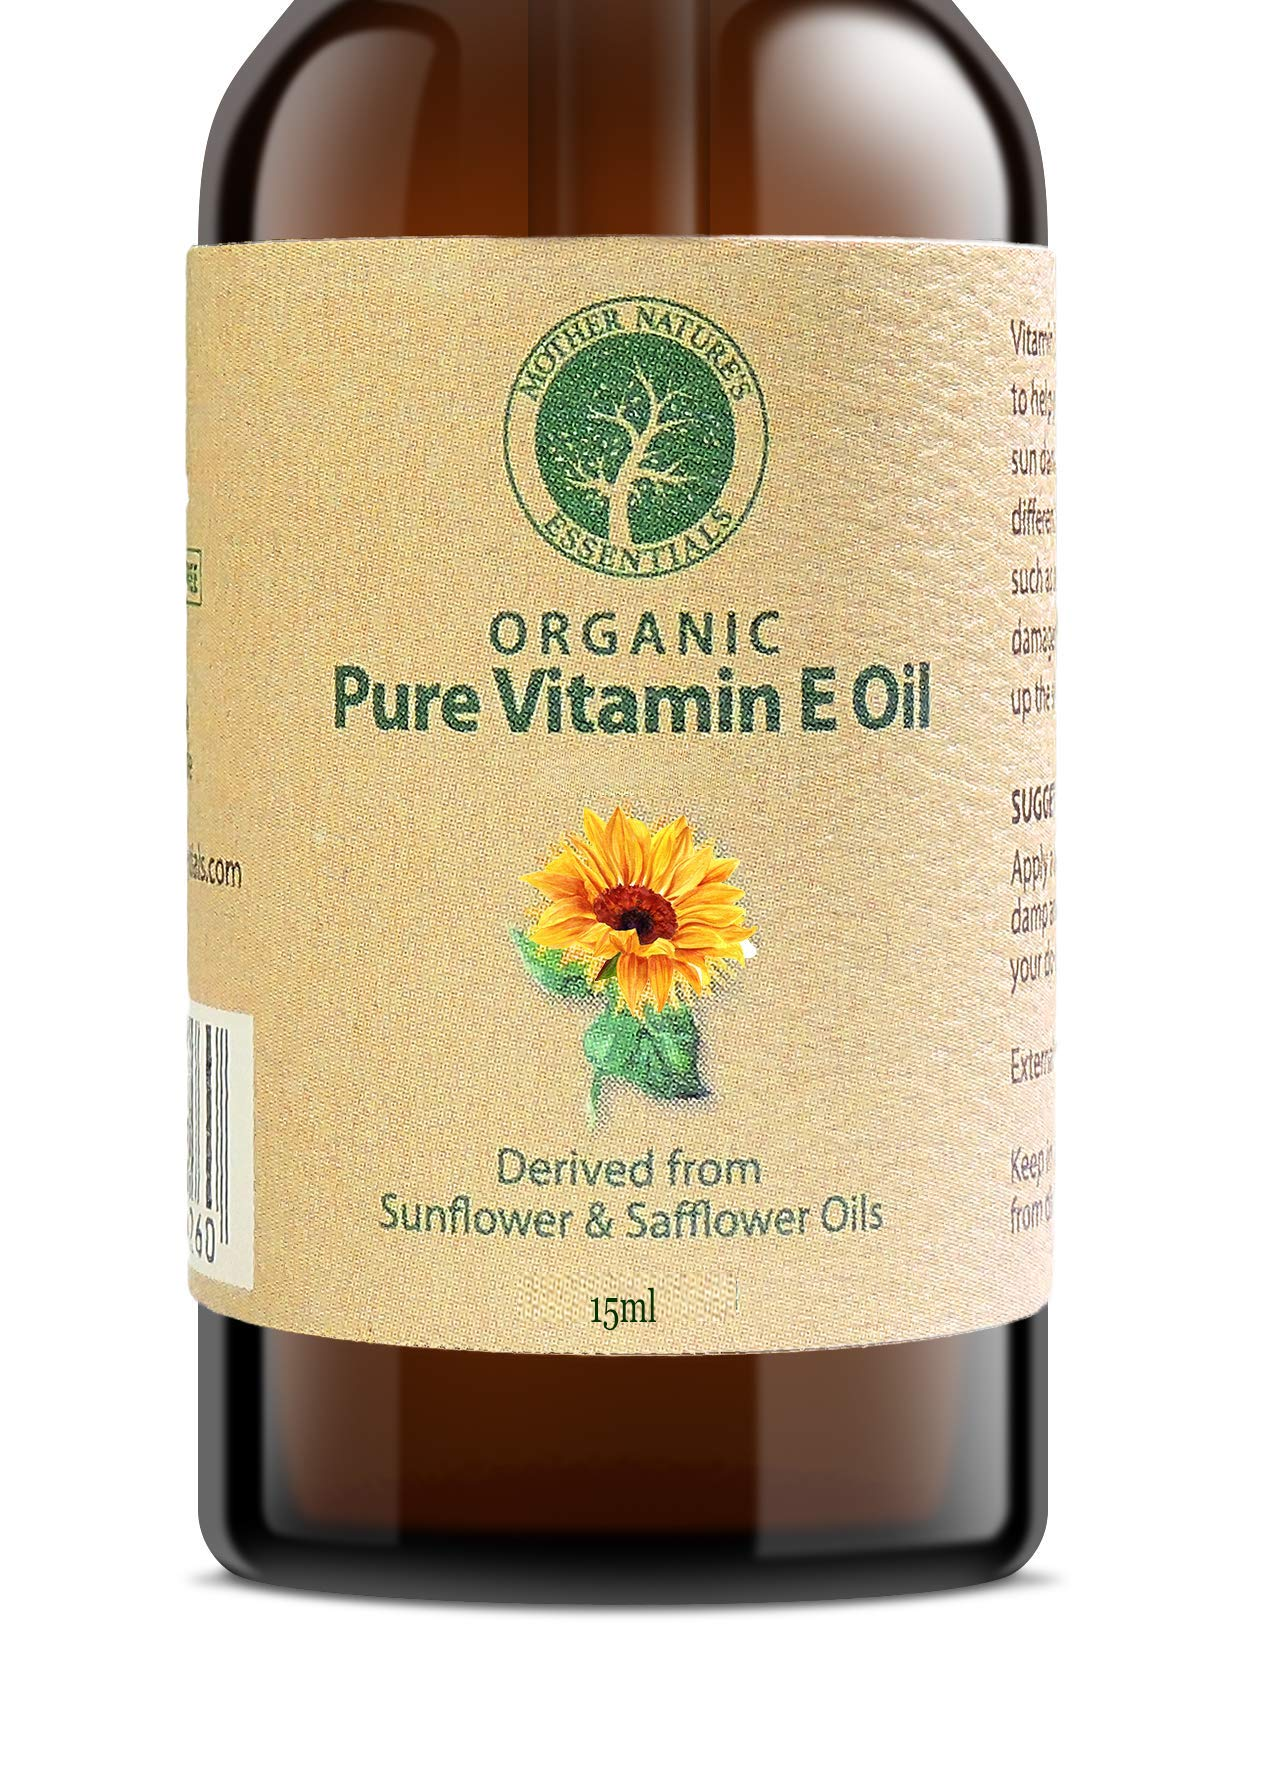 Vitamin E Oil PURE Organic d alpha tocopherol 15000IU, organic vitamin e oil derived from non-GMO Sunflower/Safflower Oil, Soy-Free and Wheat-Free. (15 mil)